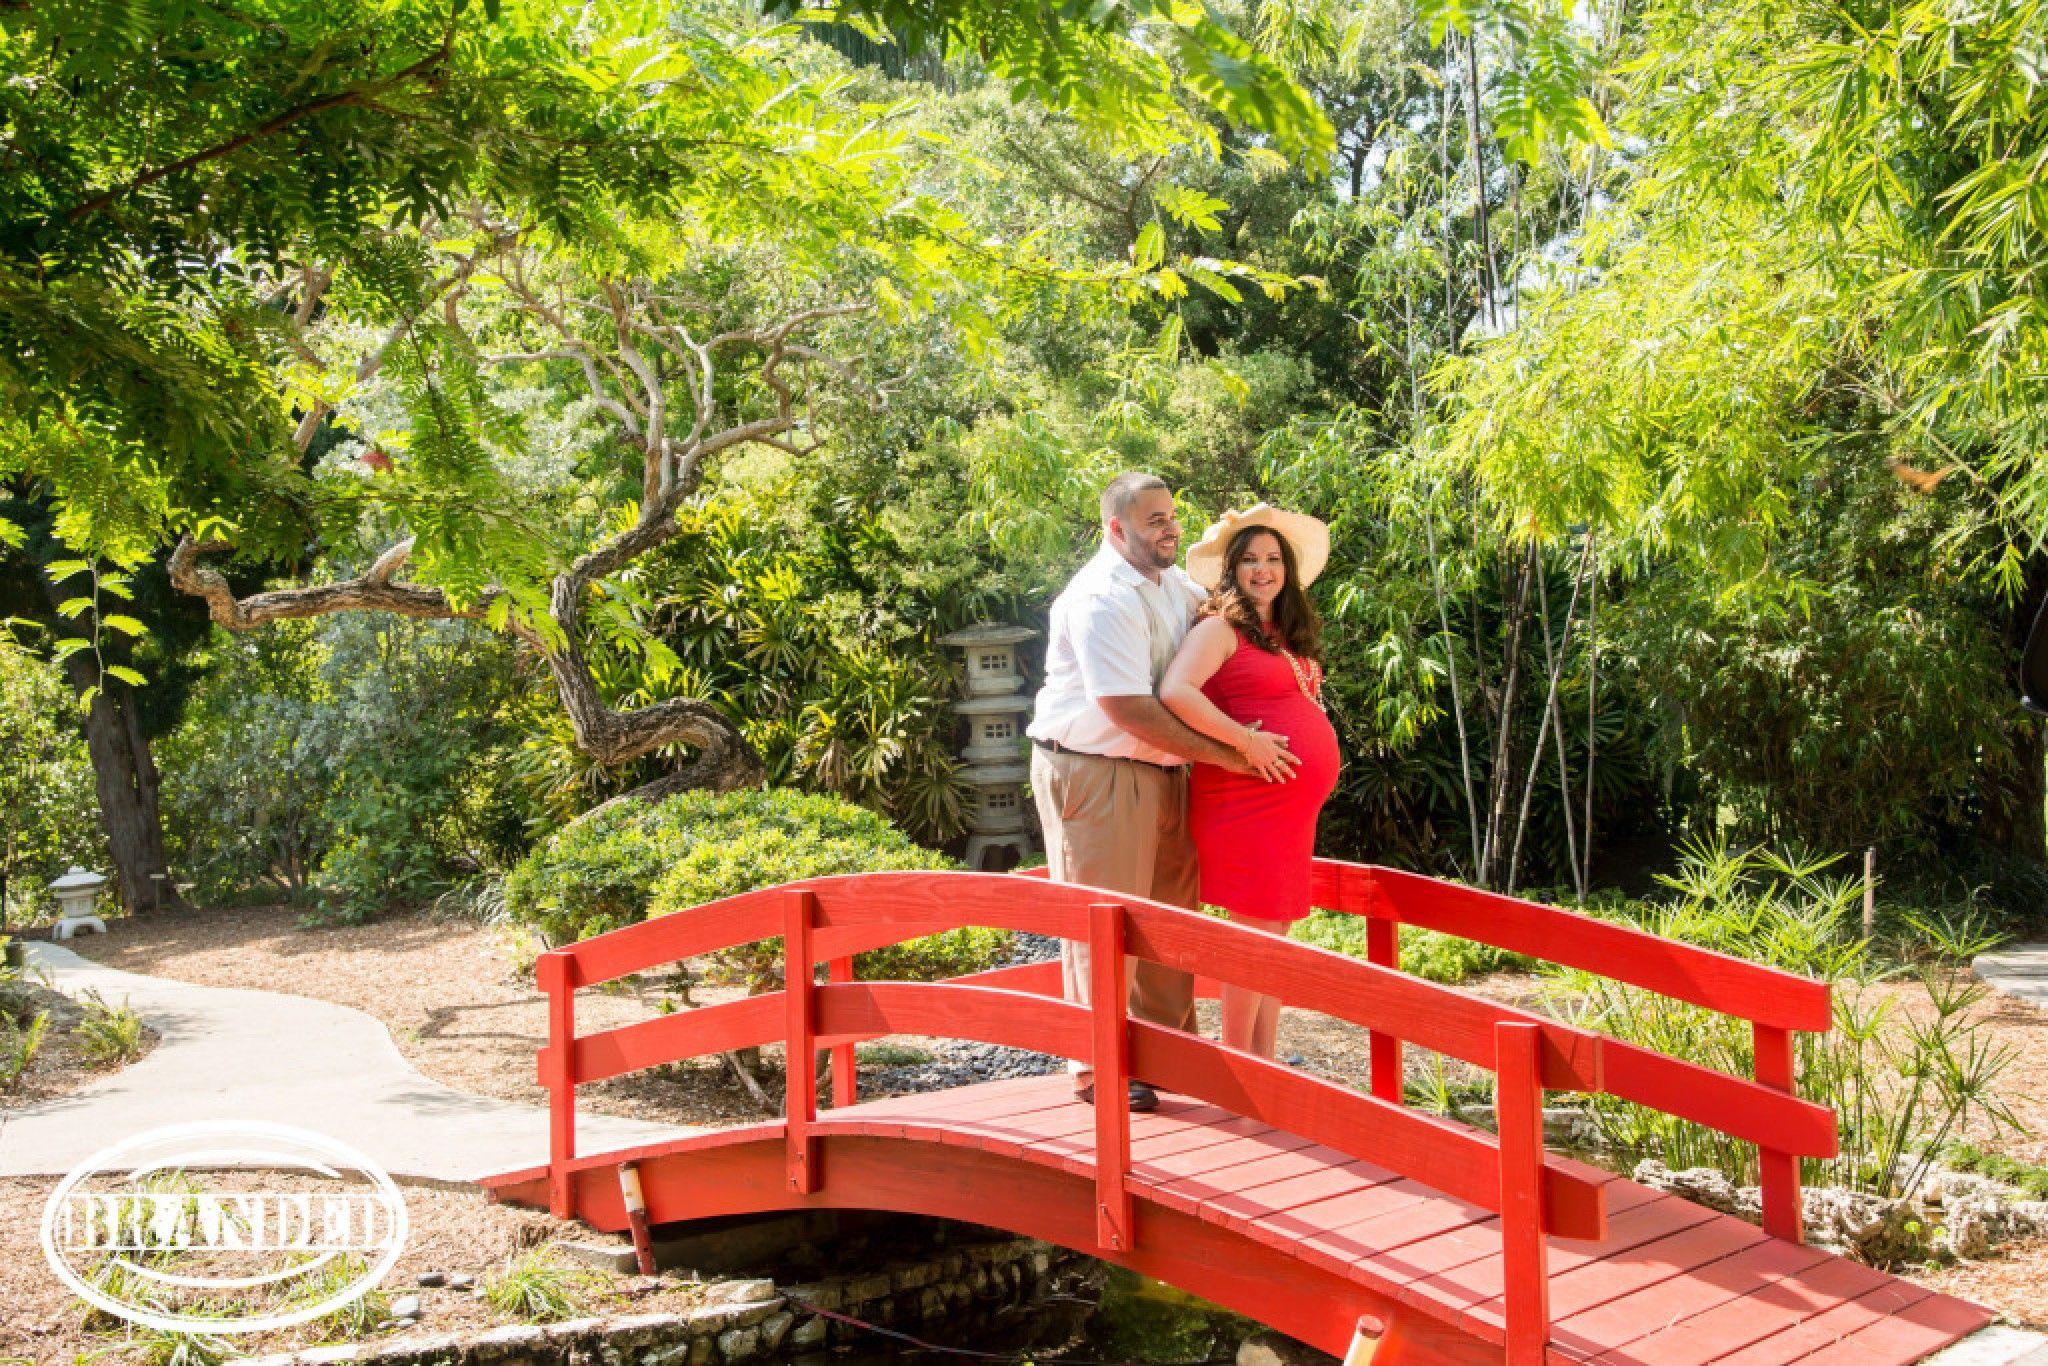 Garden Theme Maternity Photography Session - Miami Beach Botanical ...